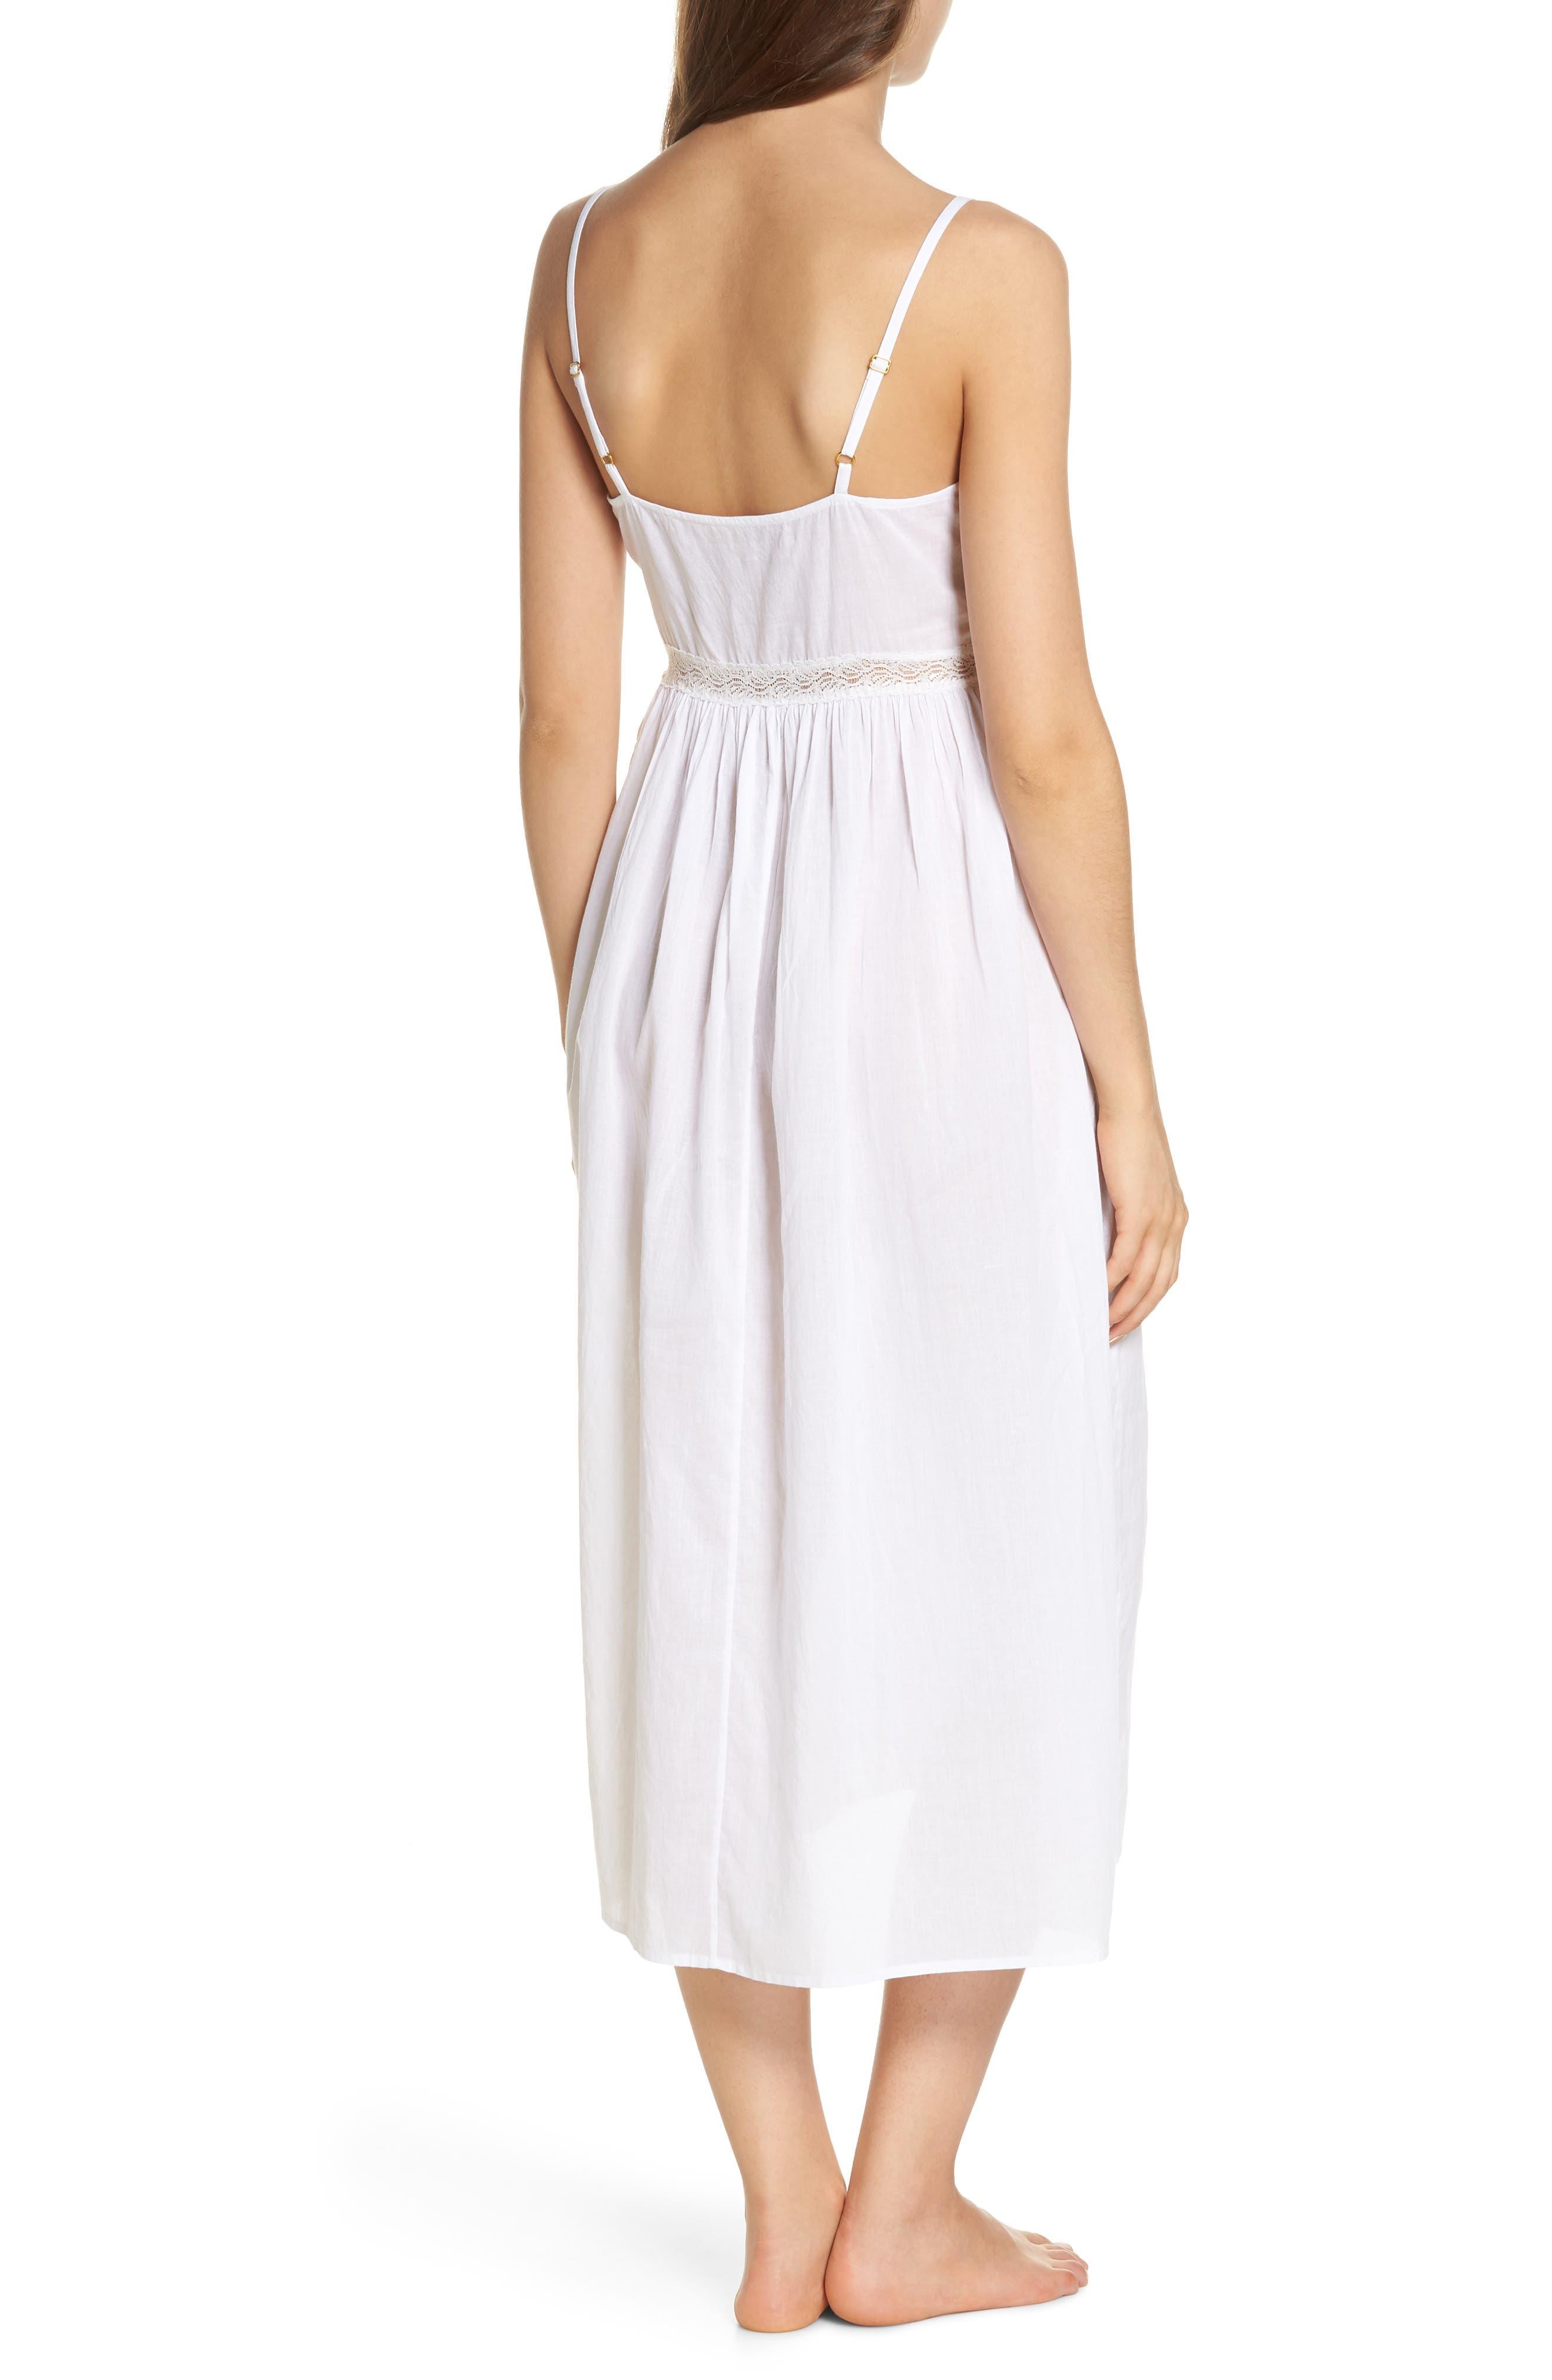 Lace Trim Nightgown,                             Alternate thumbnail 2, color,                             White